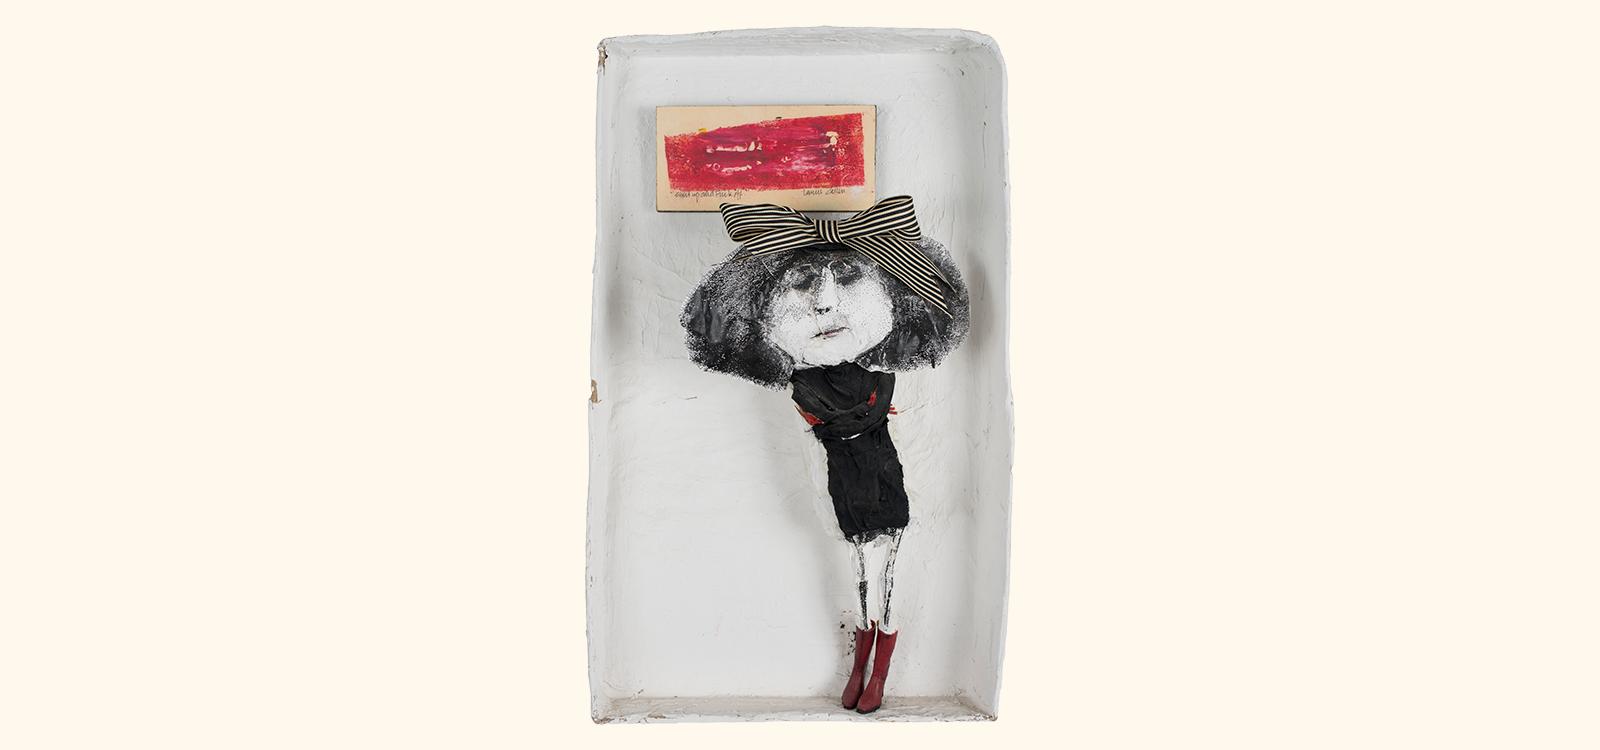 Tess - artwork by Laurie Zallen